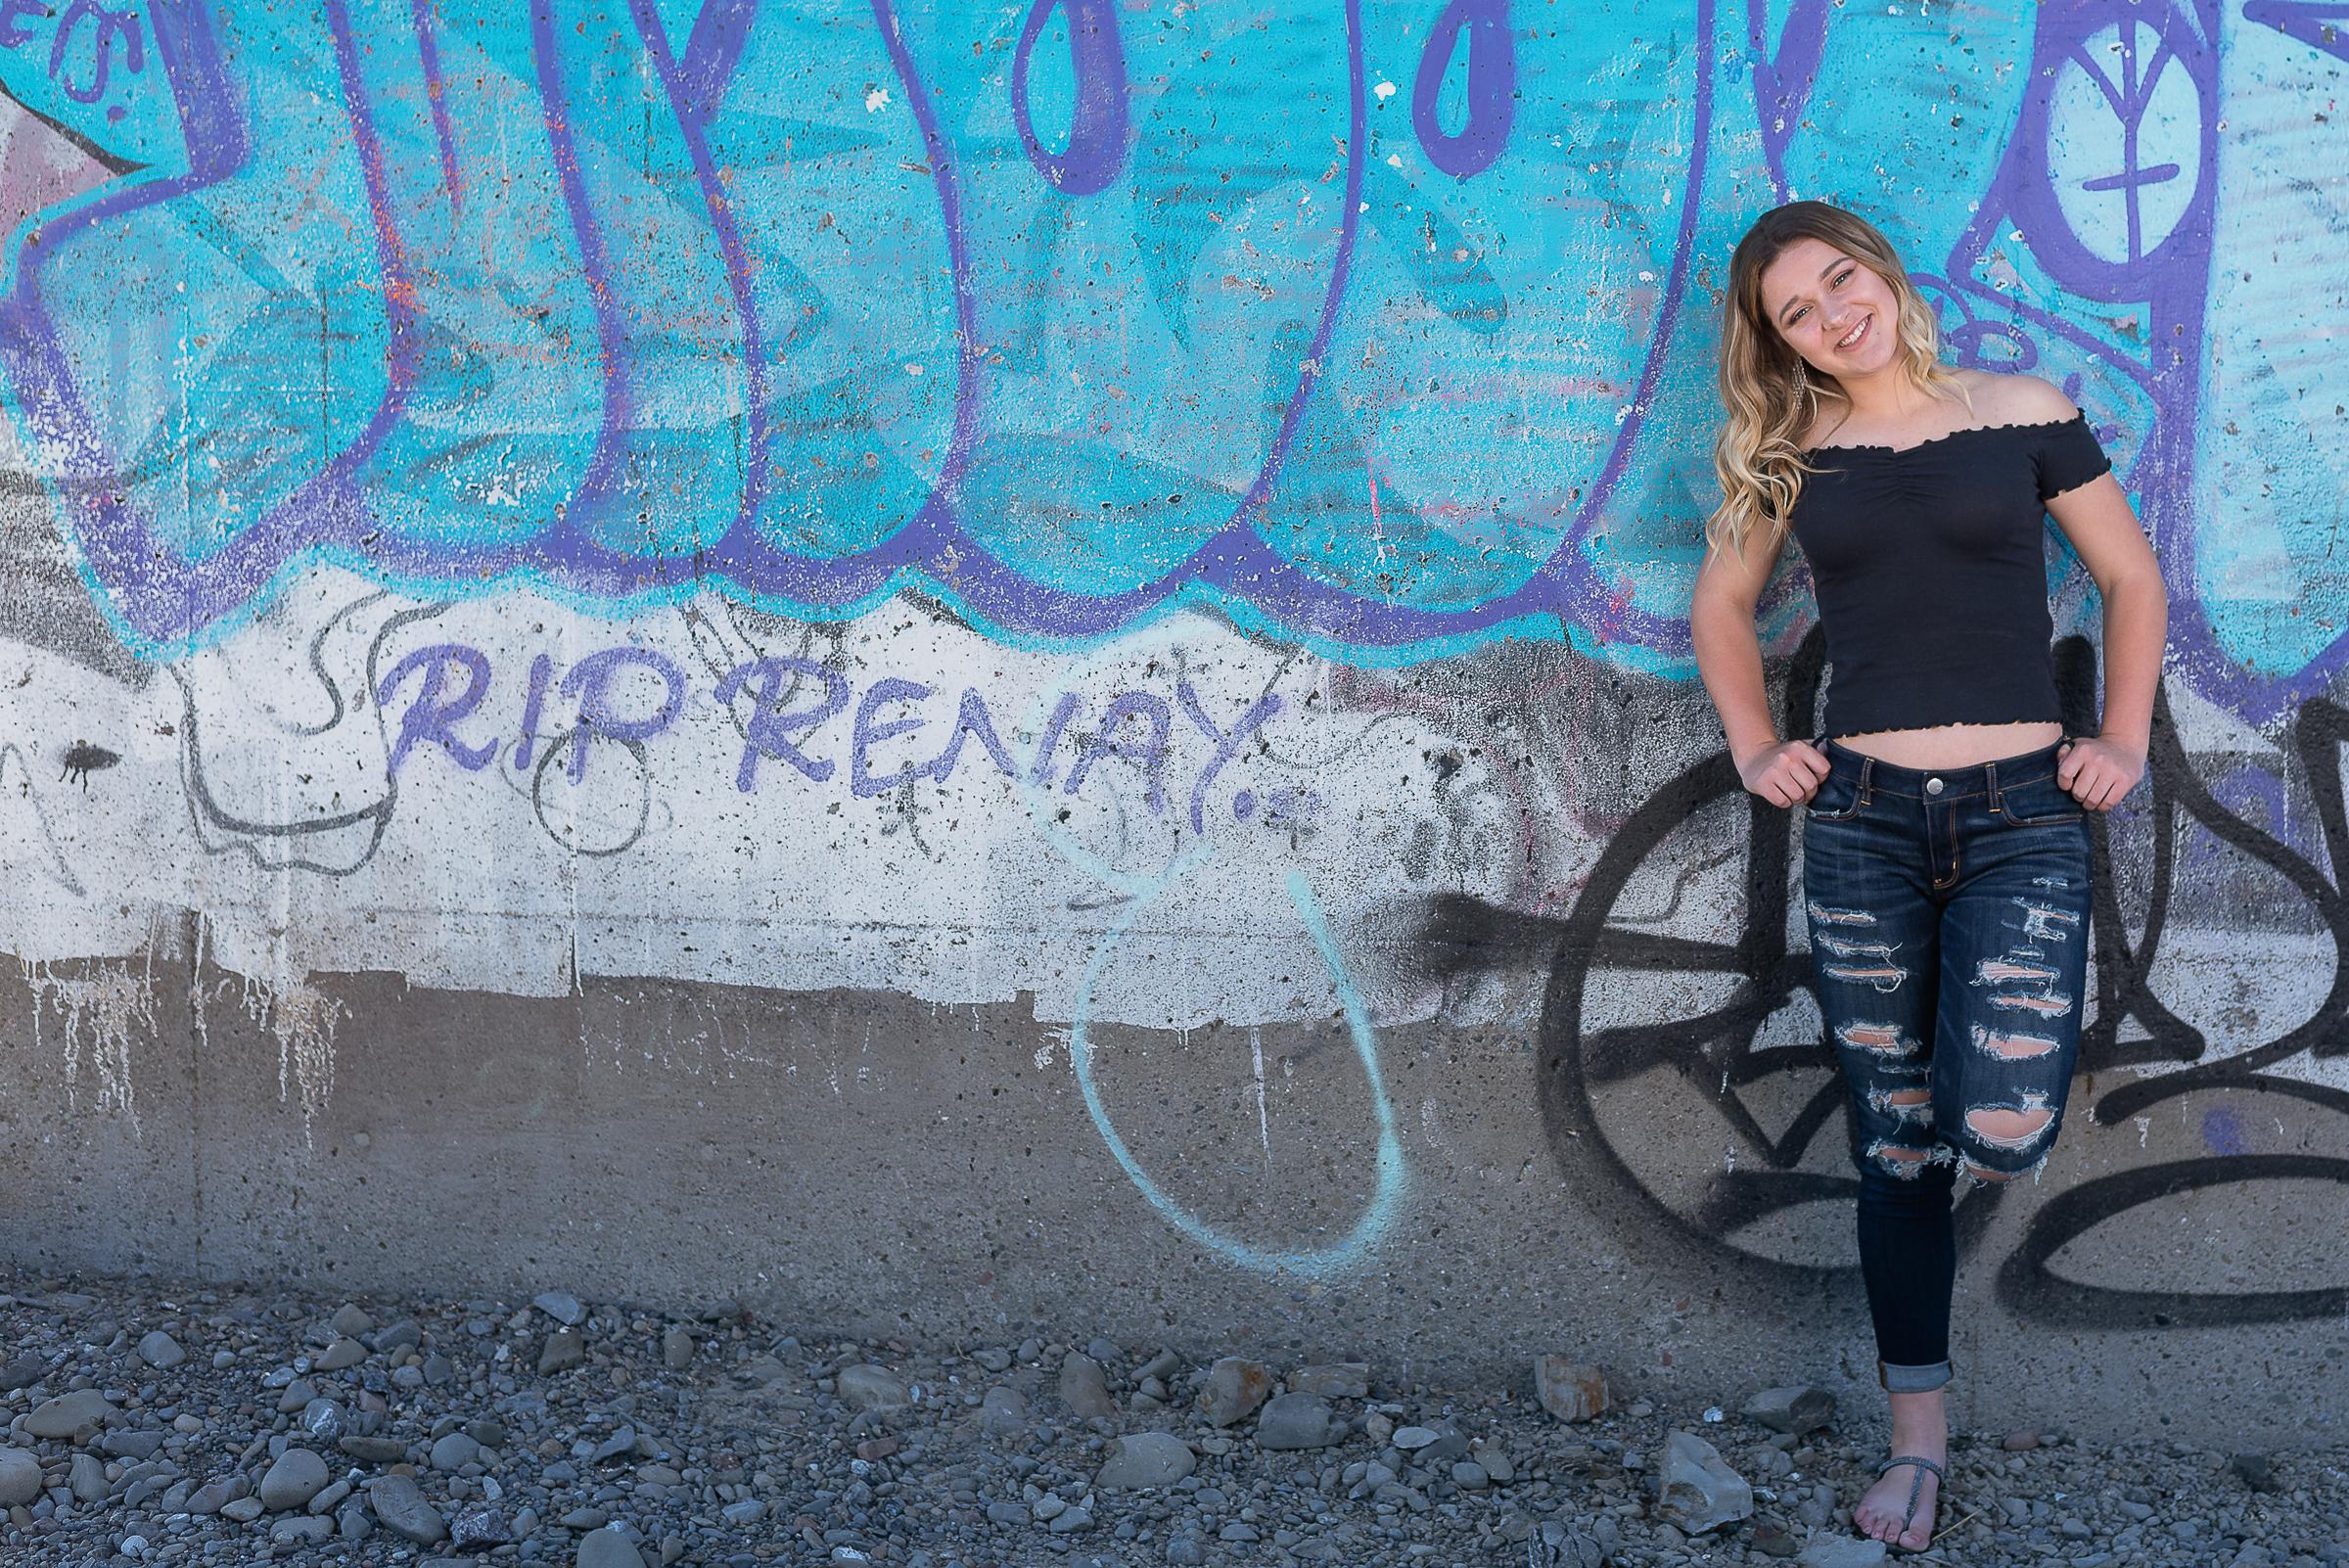 Gabby-8thGradePhotosession-BenbowInn-Parky'sPicsPhotography-4.JPG